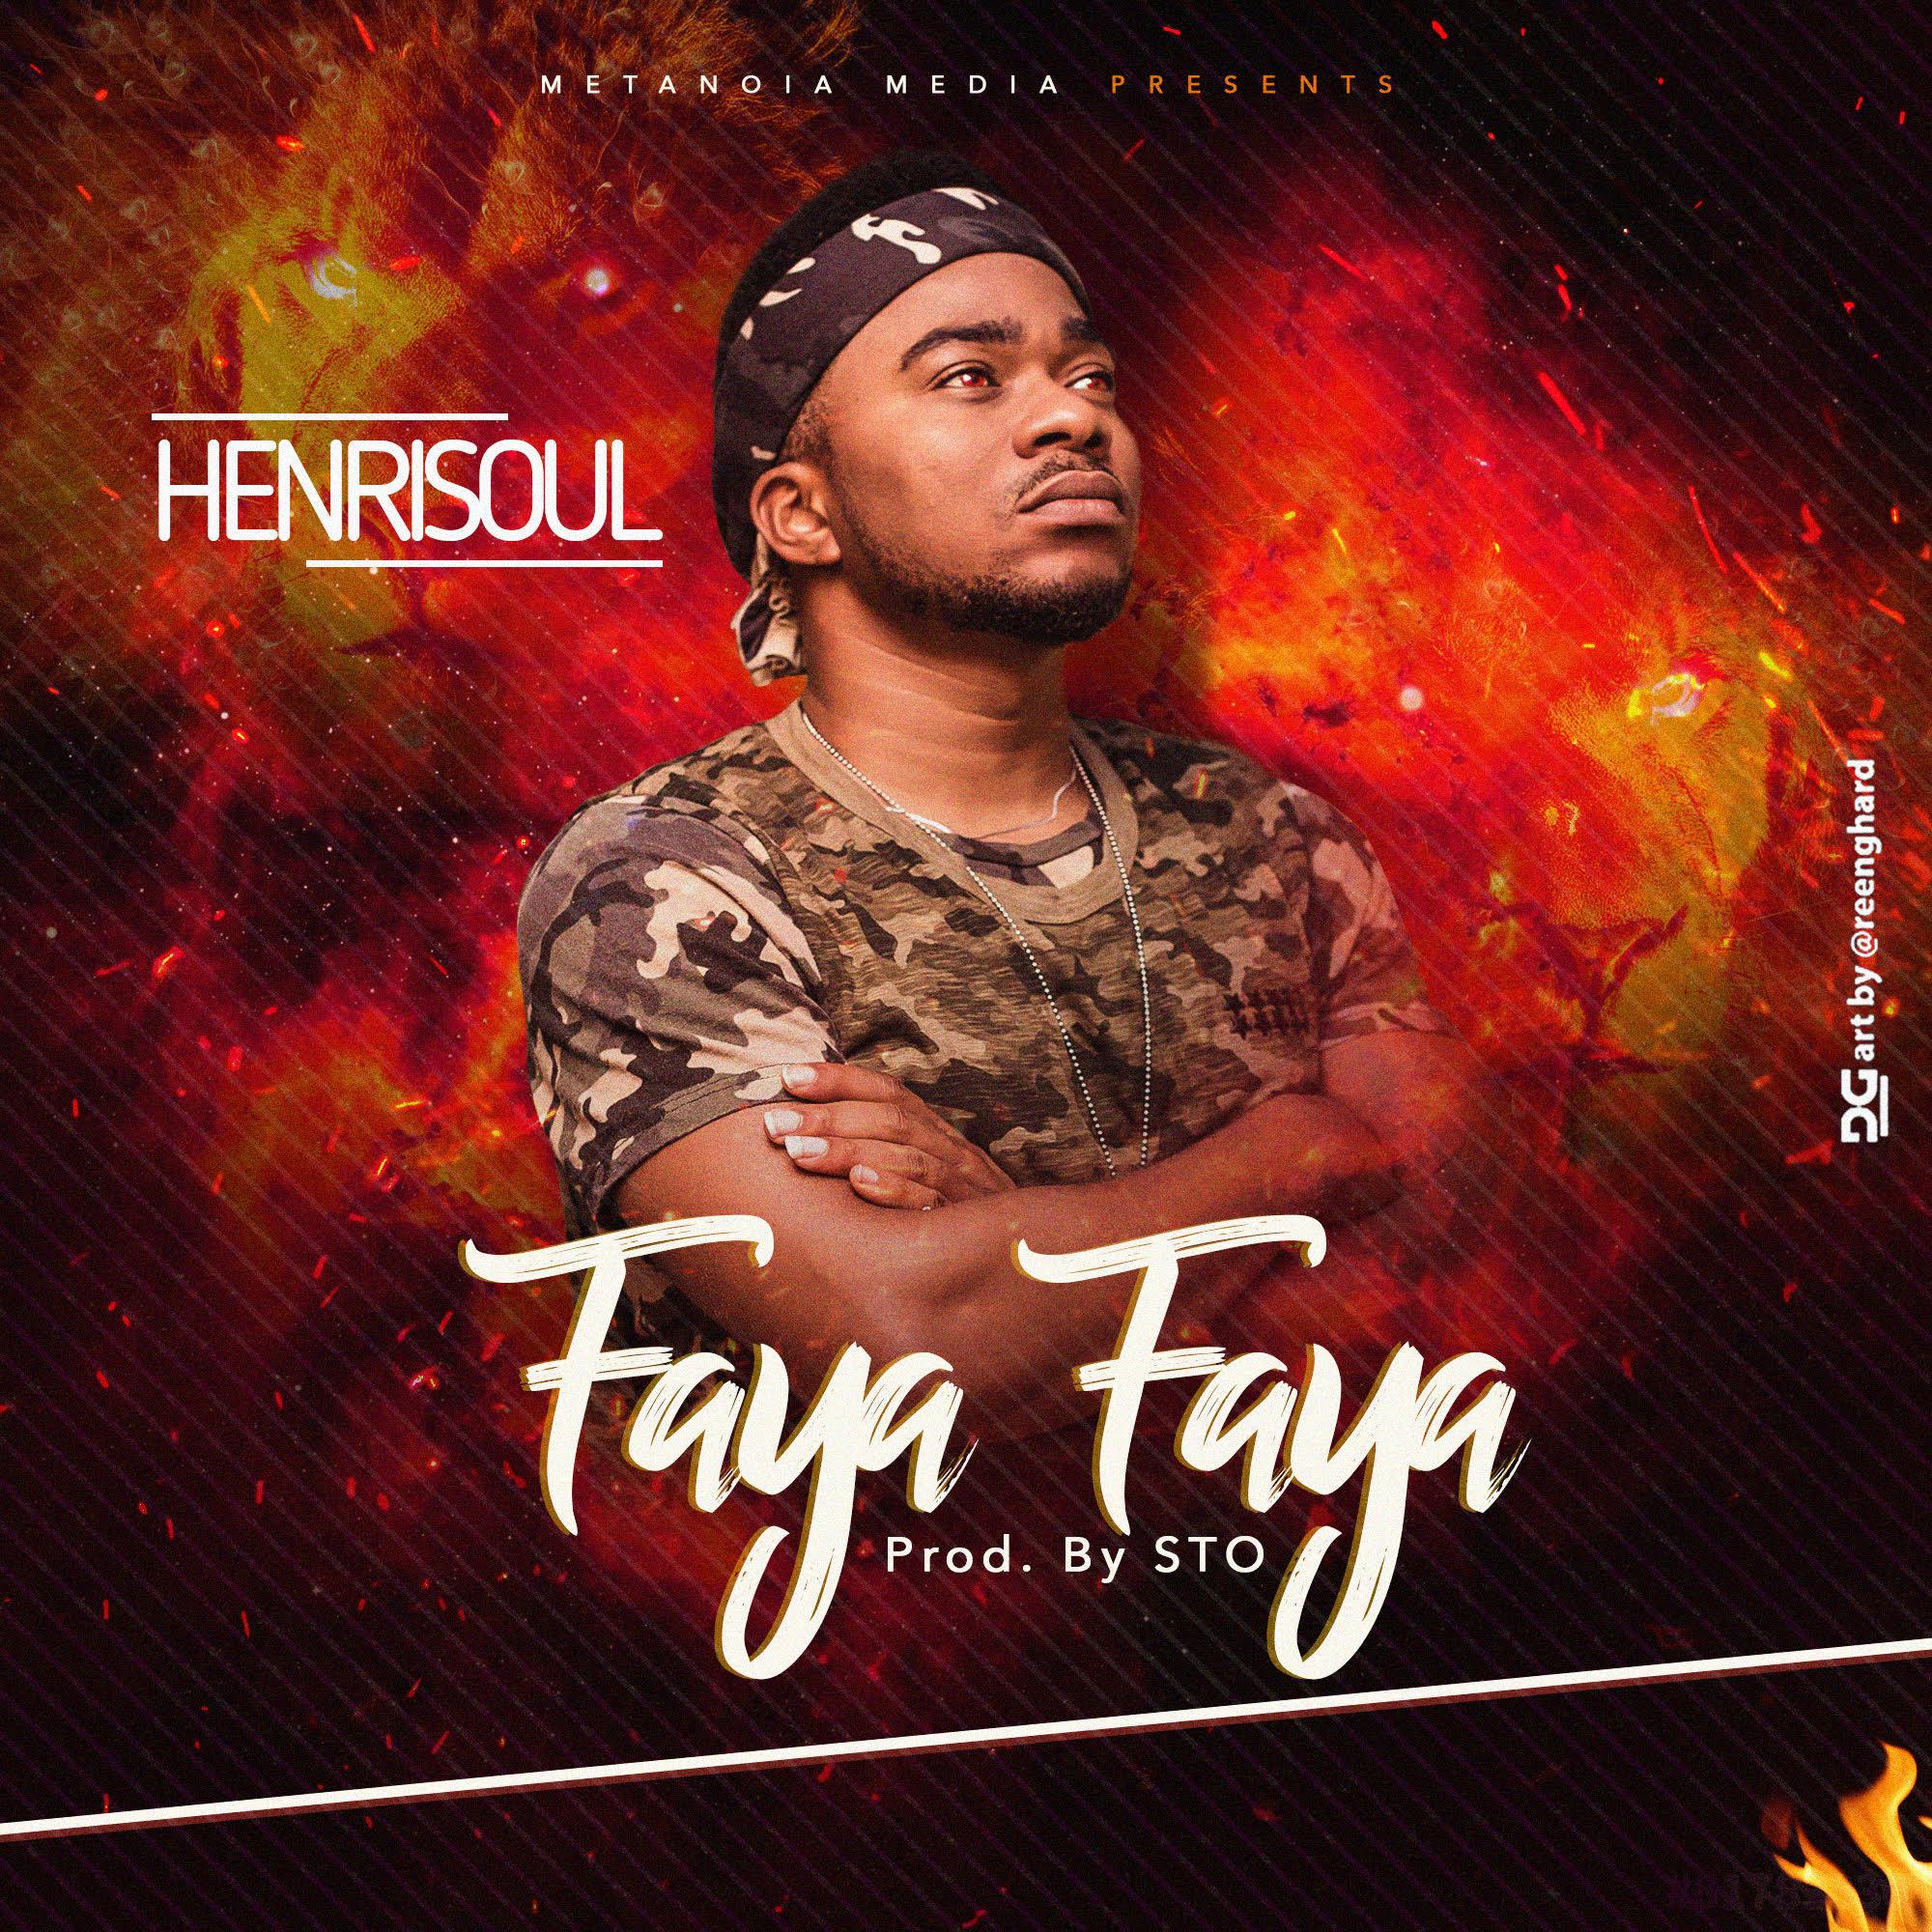 Henrisoul - Faya Faya (Prod. by STO)